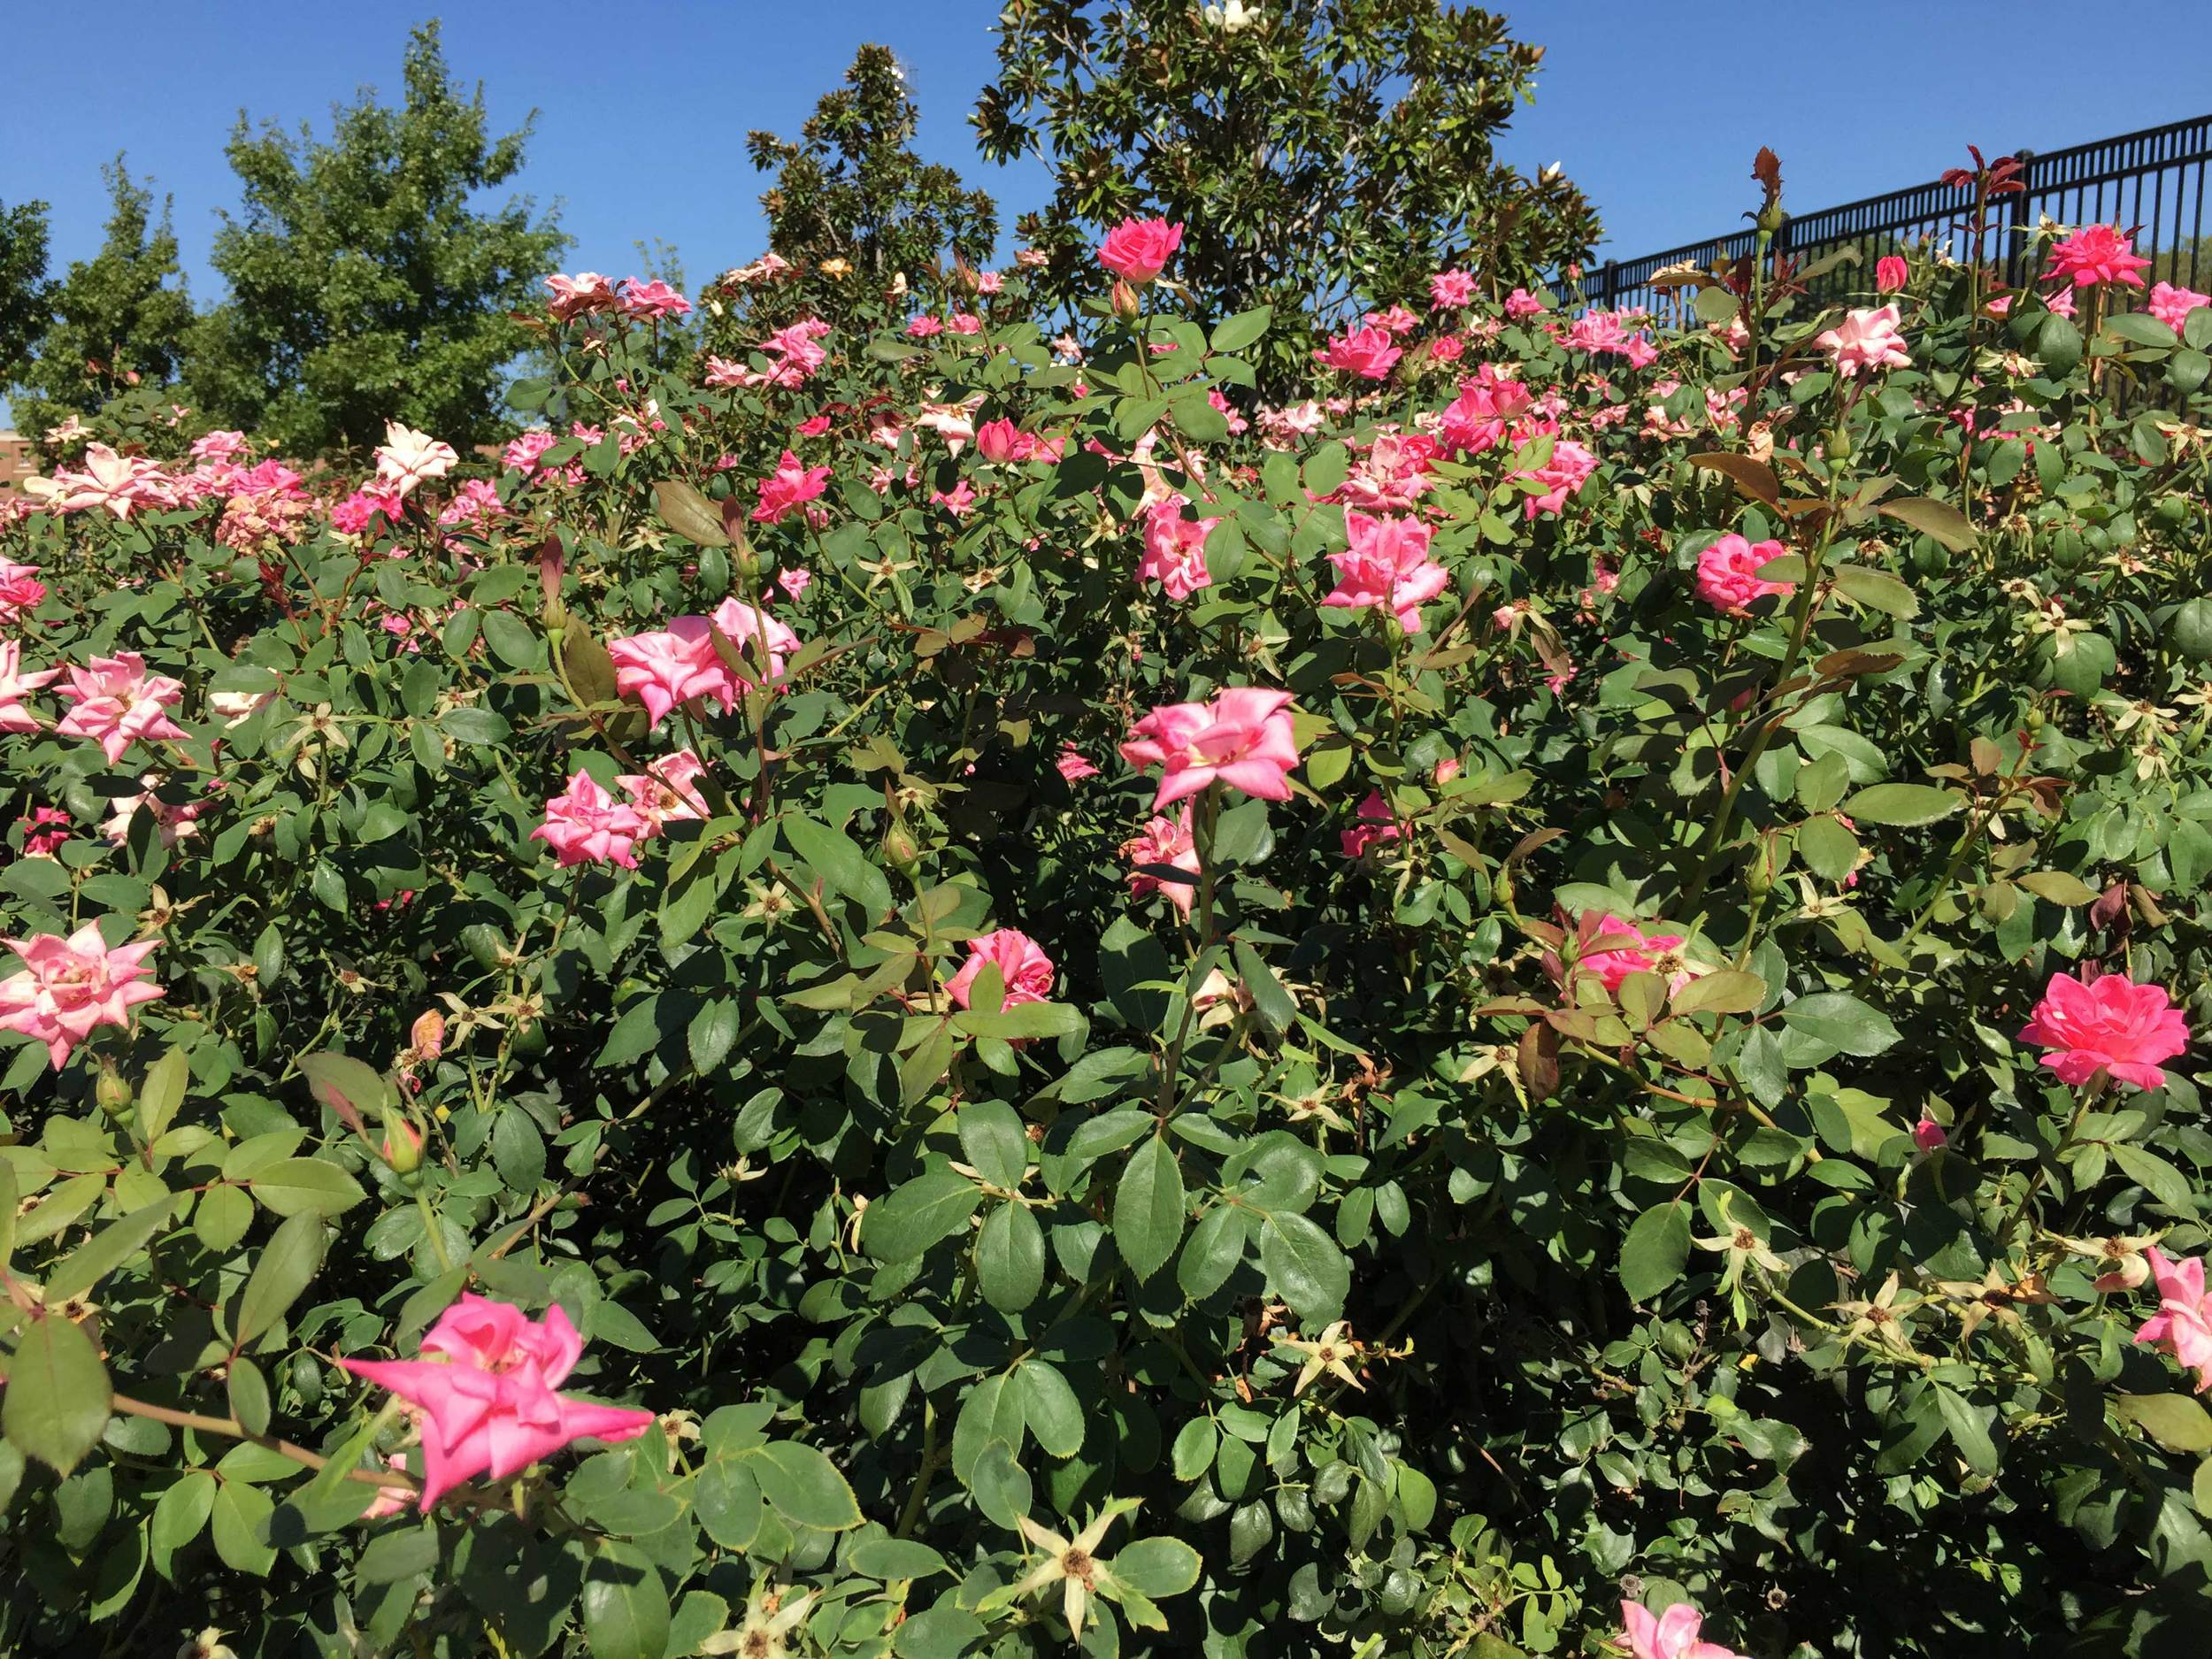 Pink Double Knockout Rose (Rosa 'Radtkopink')